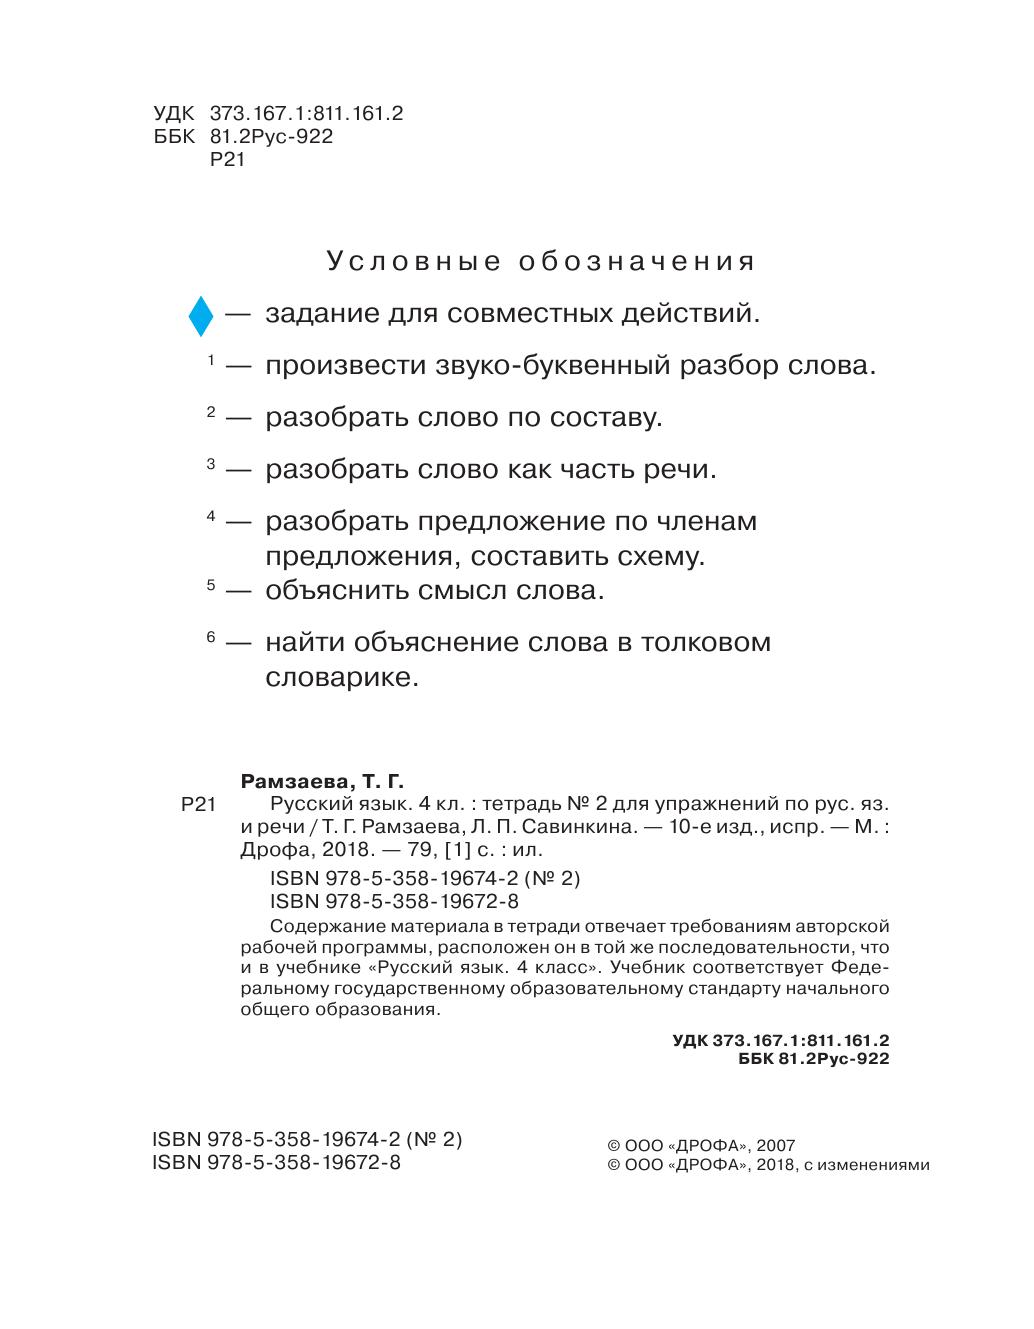 Гдз по русскому класс дрофа 2018 pdf